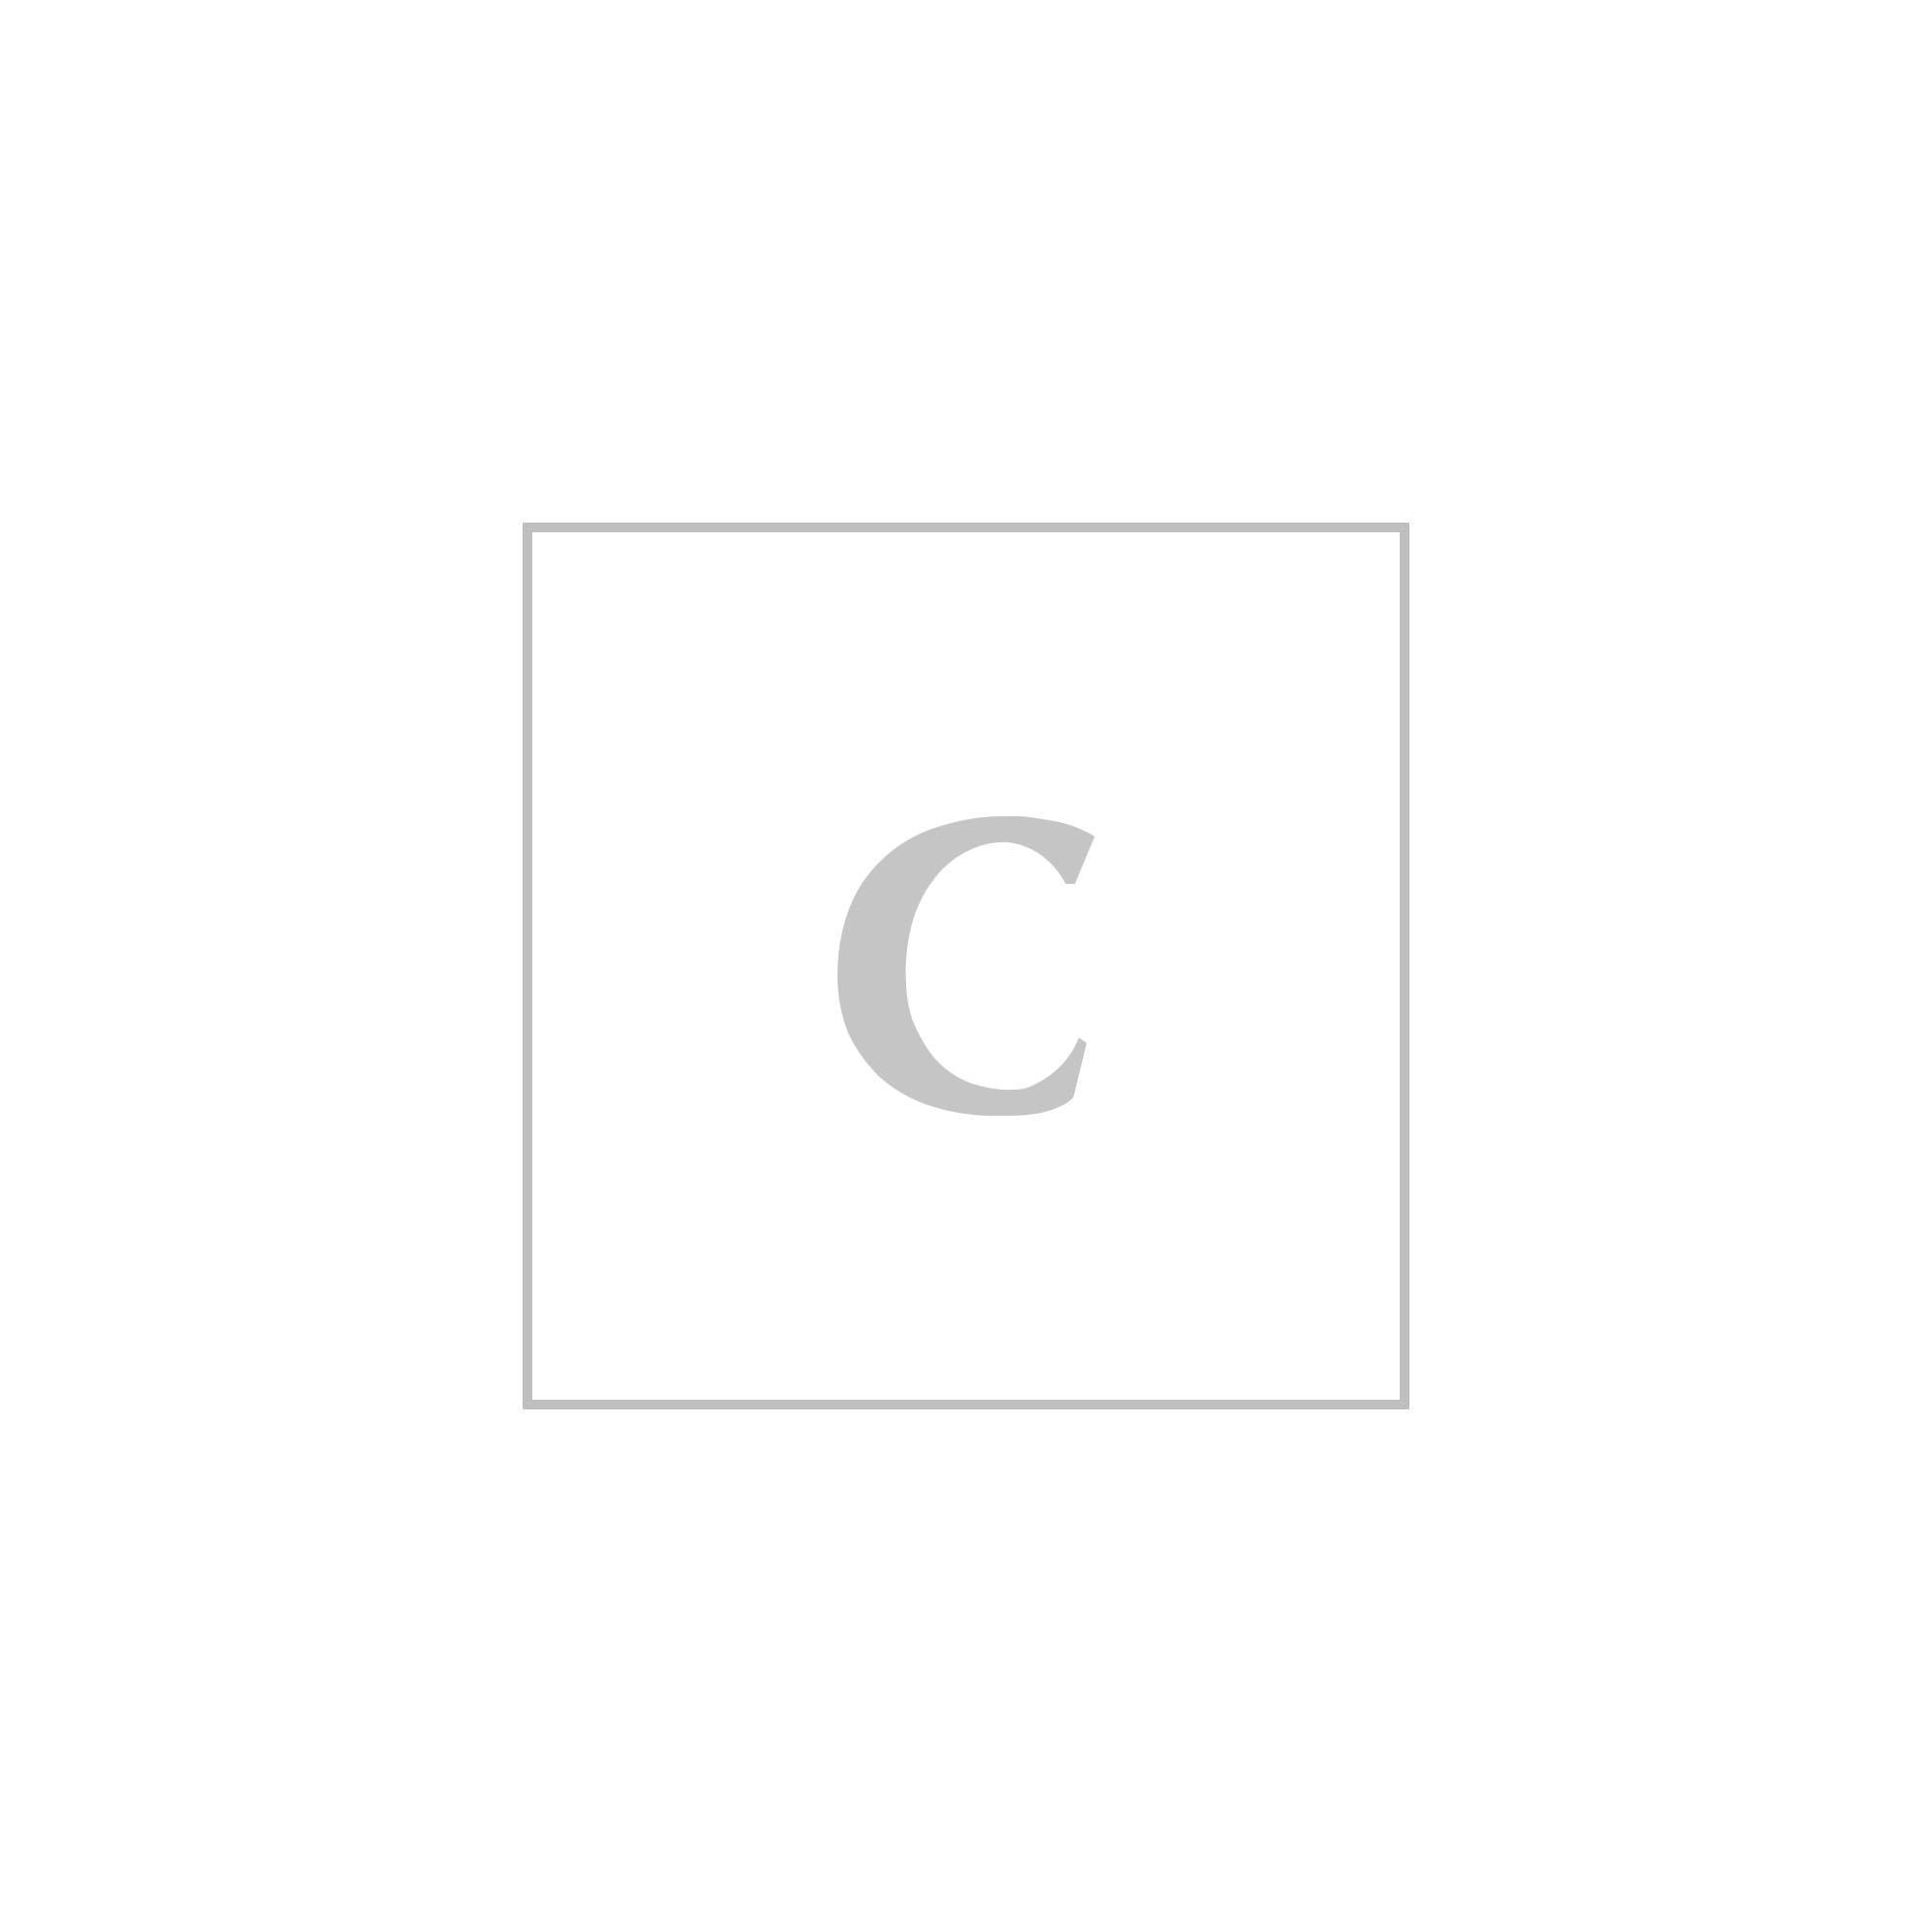 Prada borsa canapa + saffiano cuir